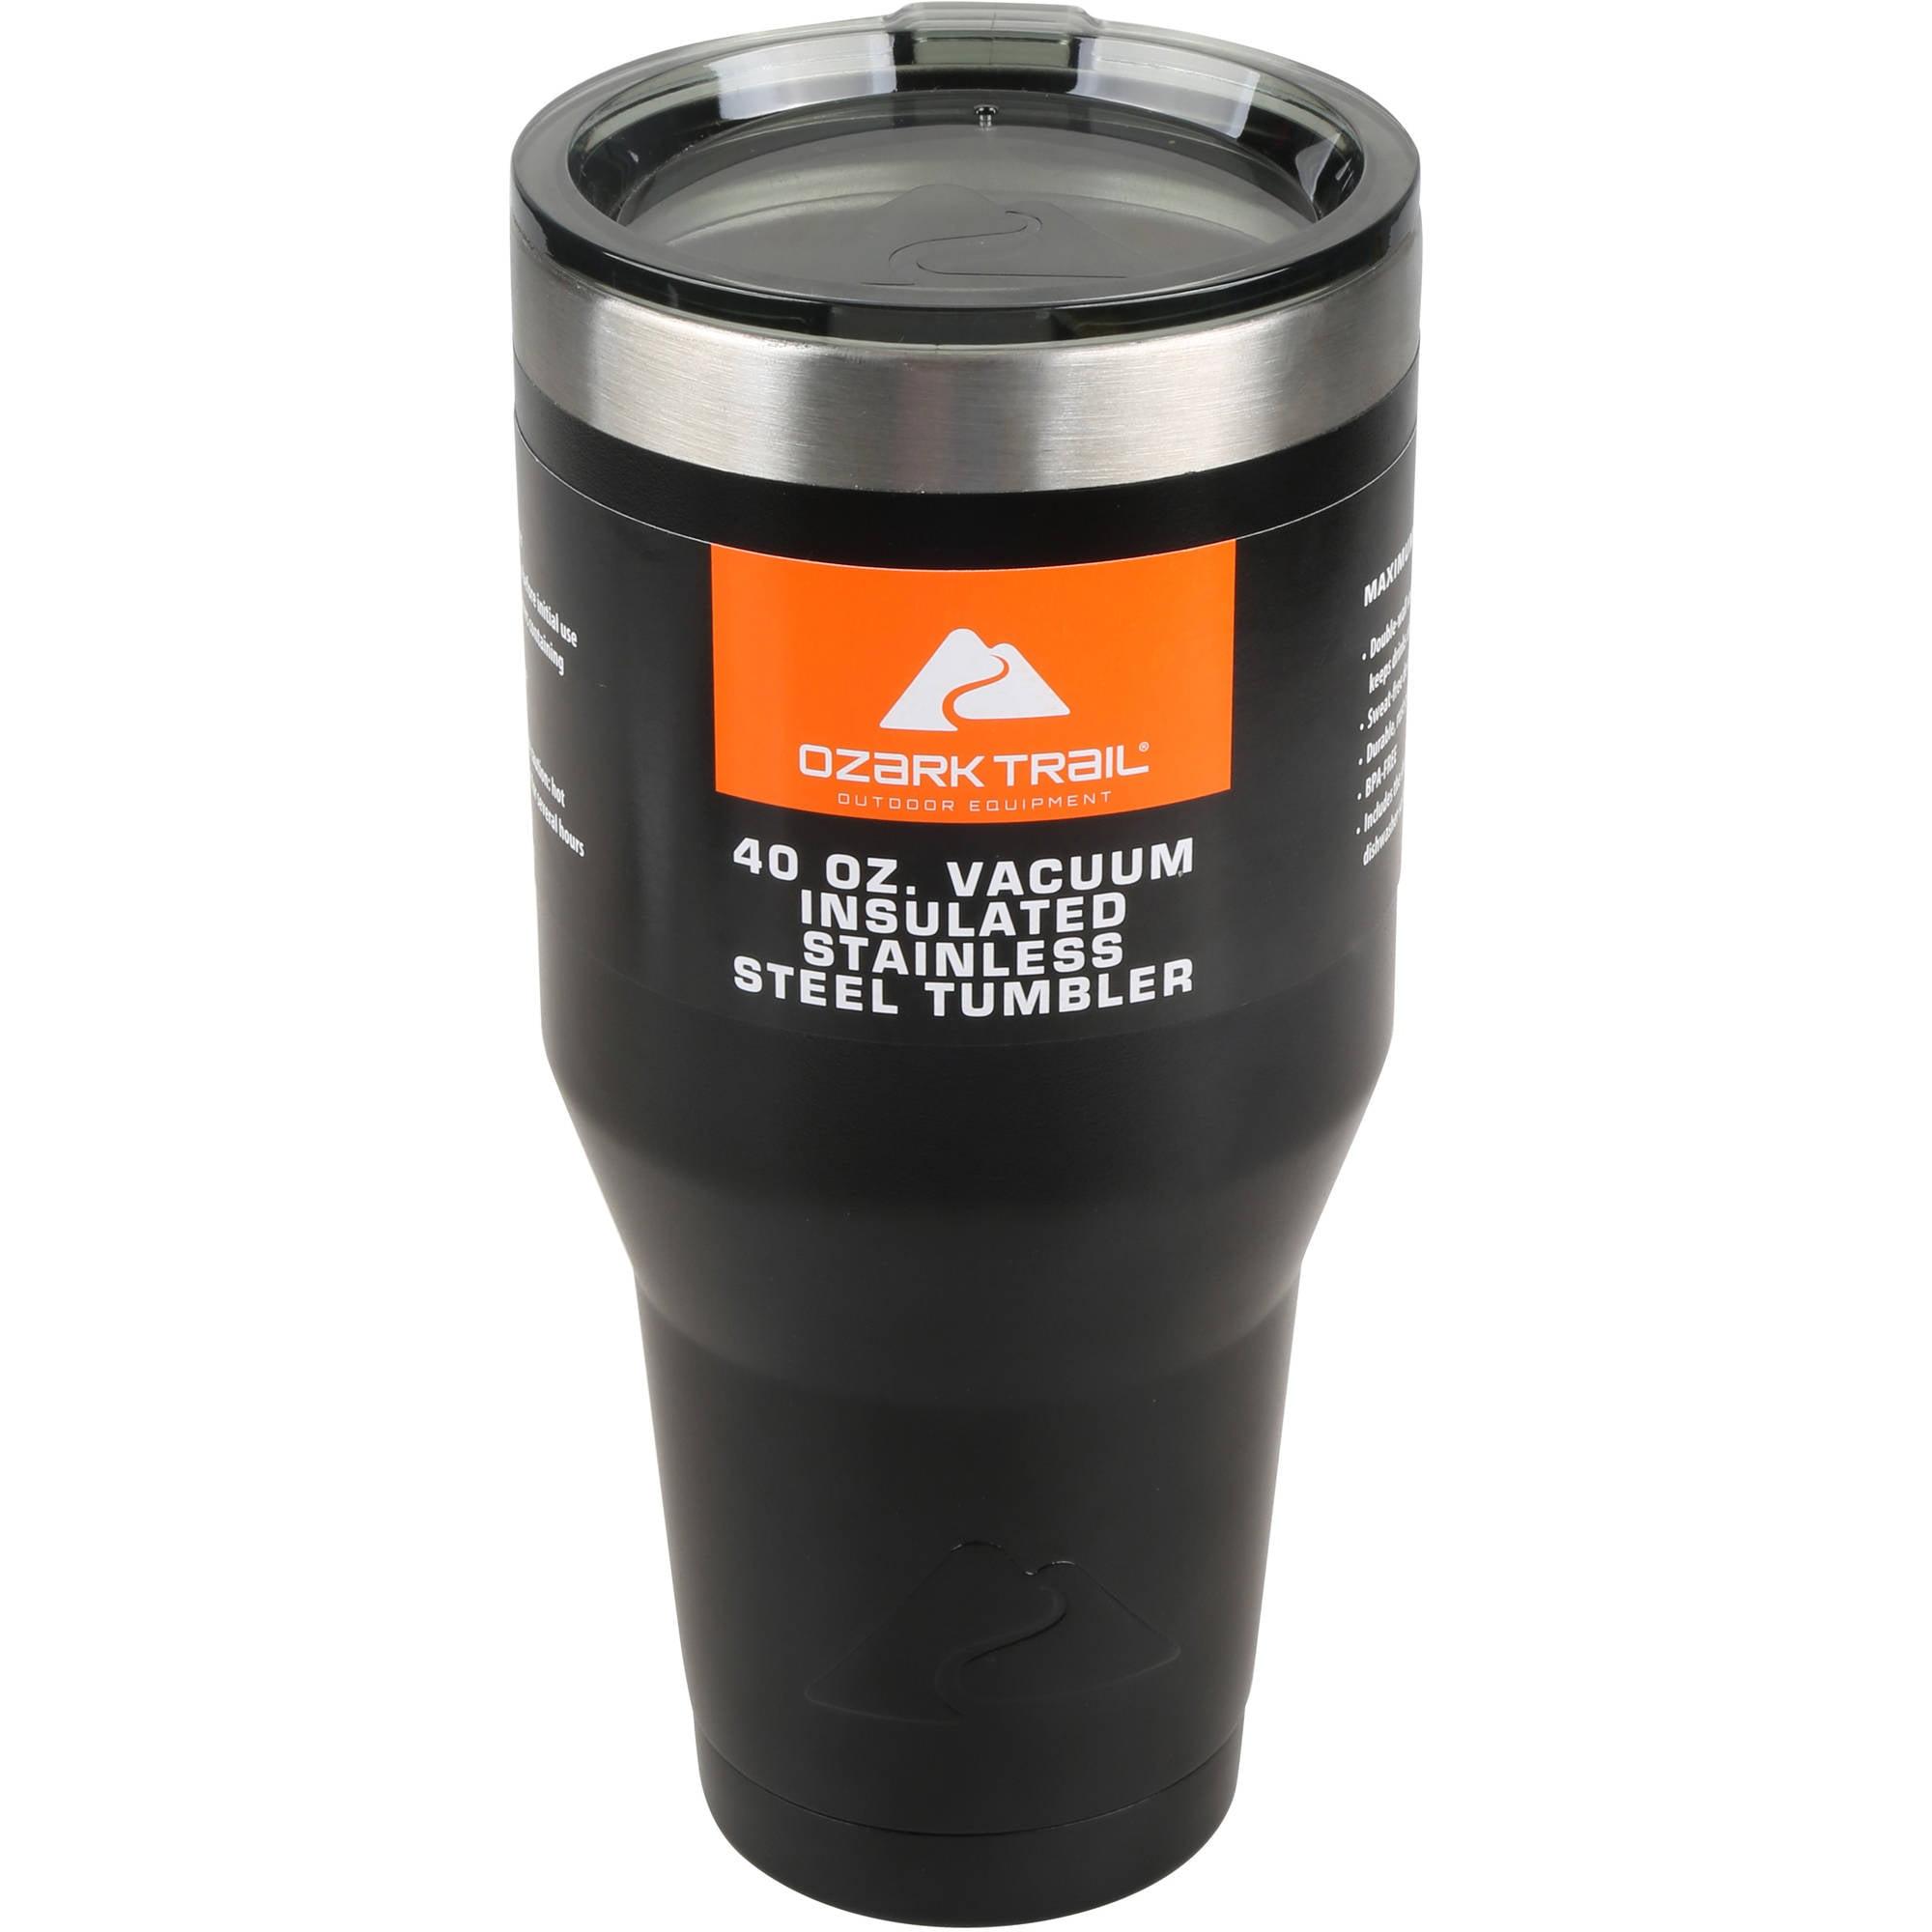 f443d396d2a Ozark Trail 40 oz Vacuum Insulated Stainless Steel Tumbler – Walmart ...